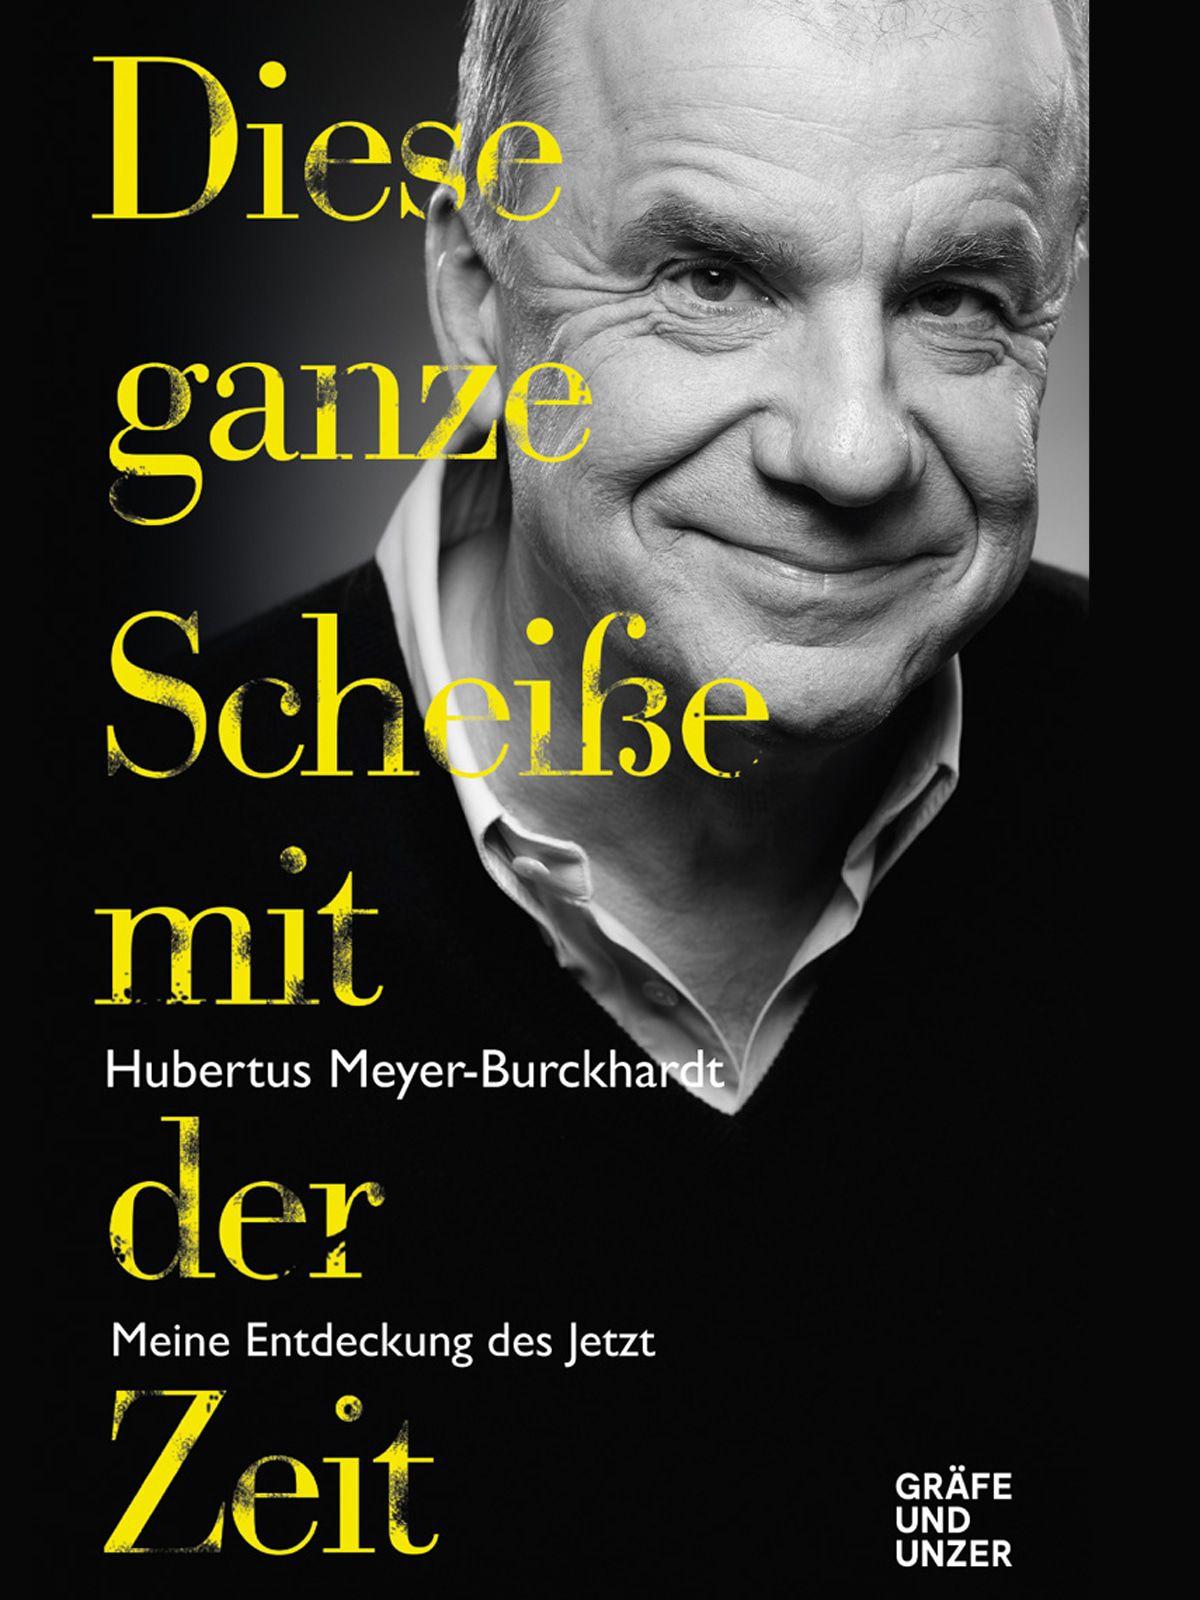 Talkshow-Legende Hubertus Meyer-Burckhardt offenbart Krebserkrankung